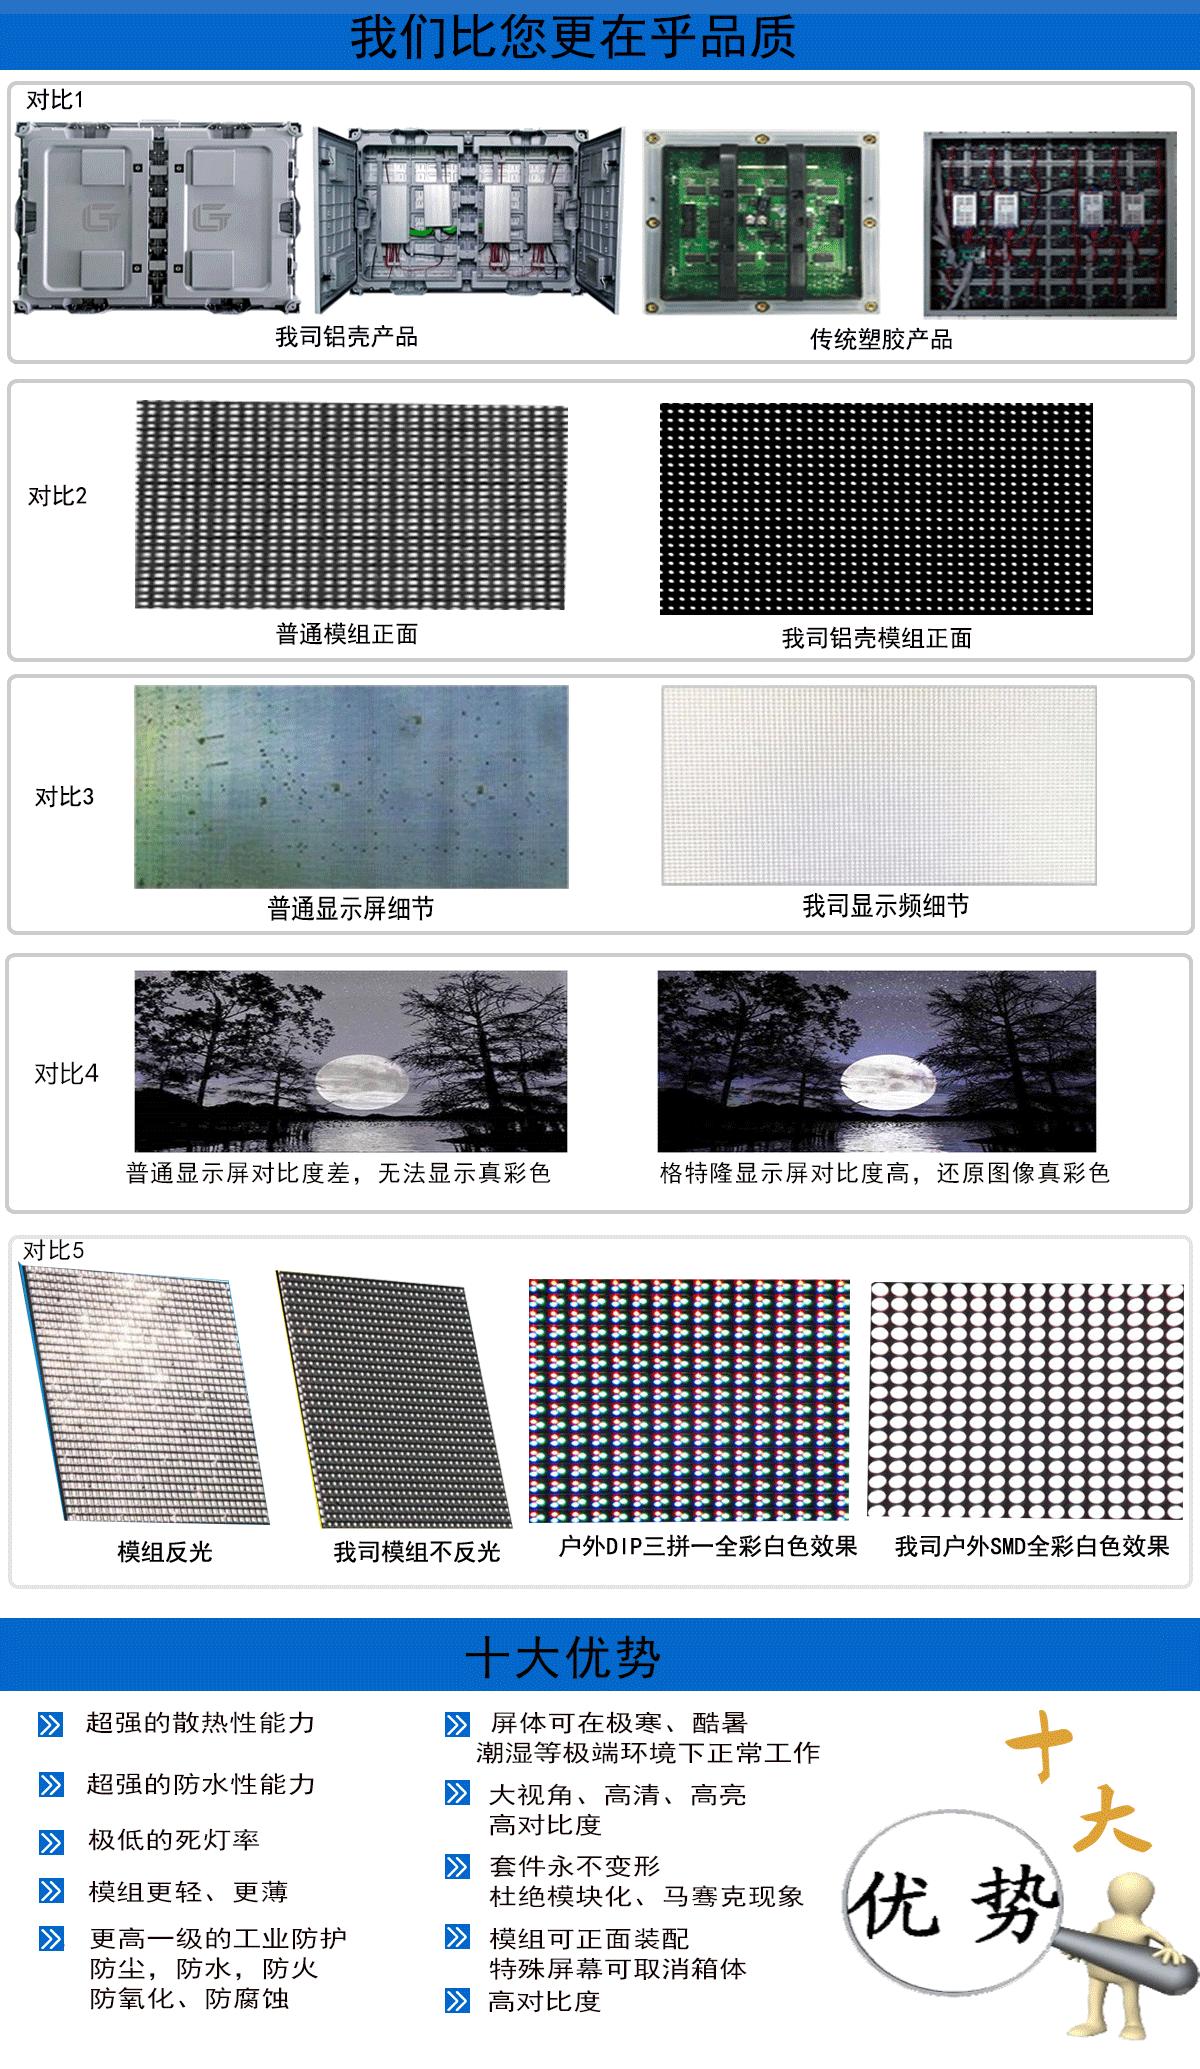 P4節能壓鑄系列|室外高清LED系列-鑫盛達(寧夏)光電技術發展有限公司